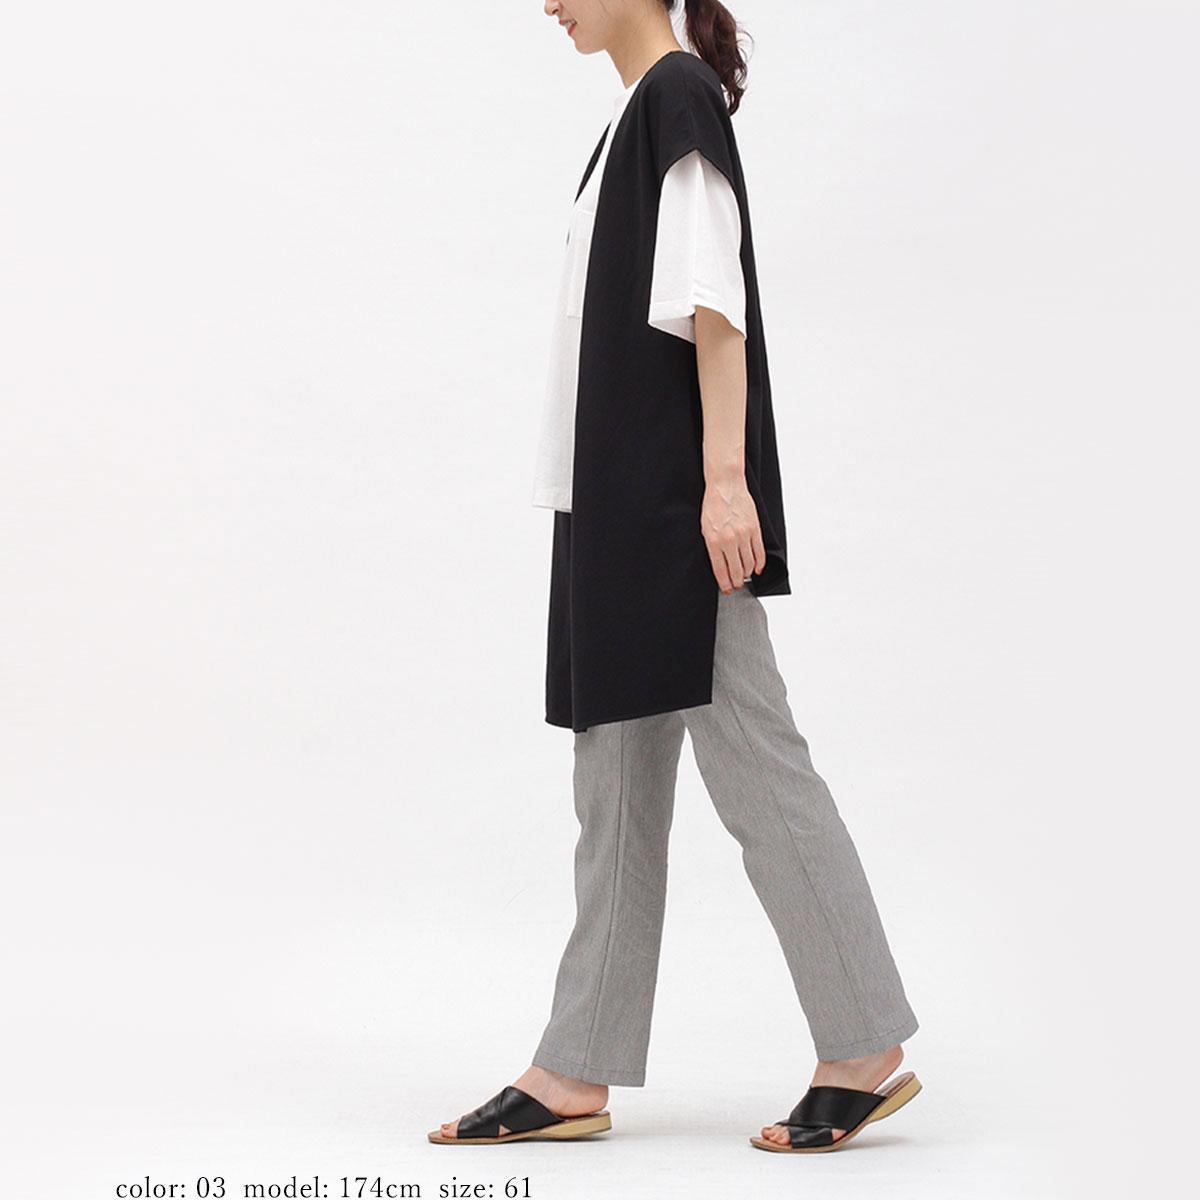 【SALE】Mrs.Jeana ■涼■サマーディナーストレート MJ4642